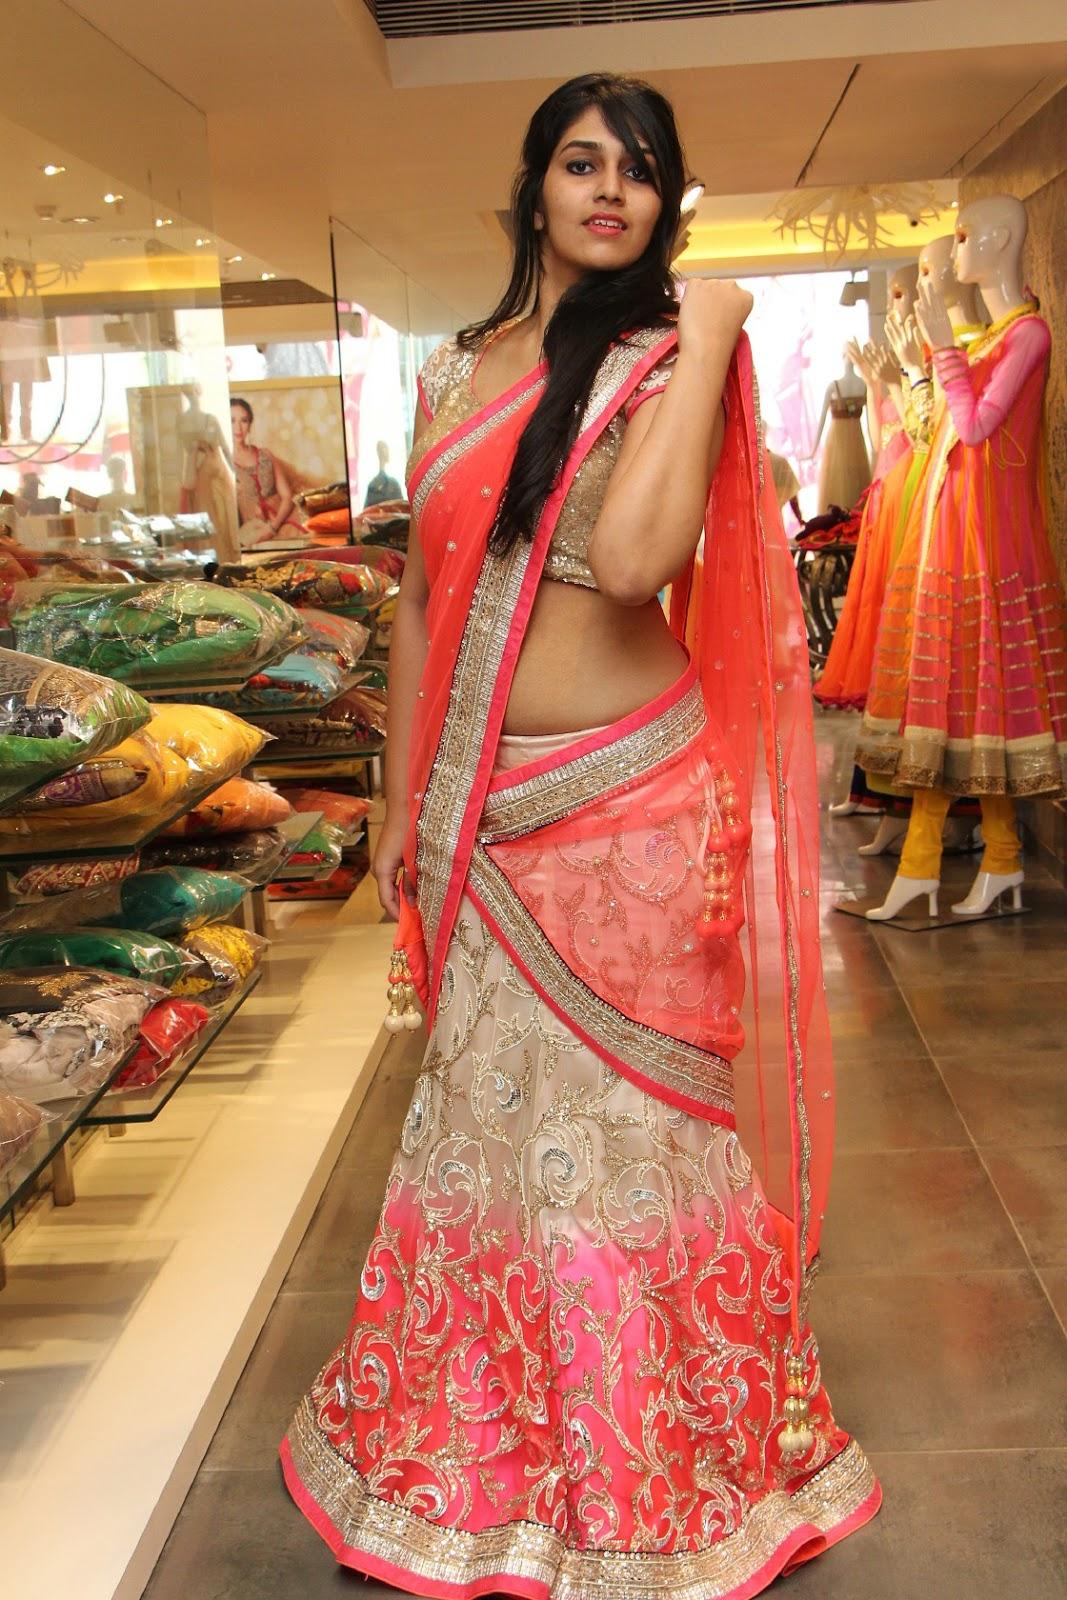 Beauty Galore HD : Saloni Neerus Hot South Indian Model In Half Sari